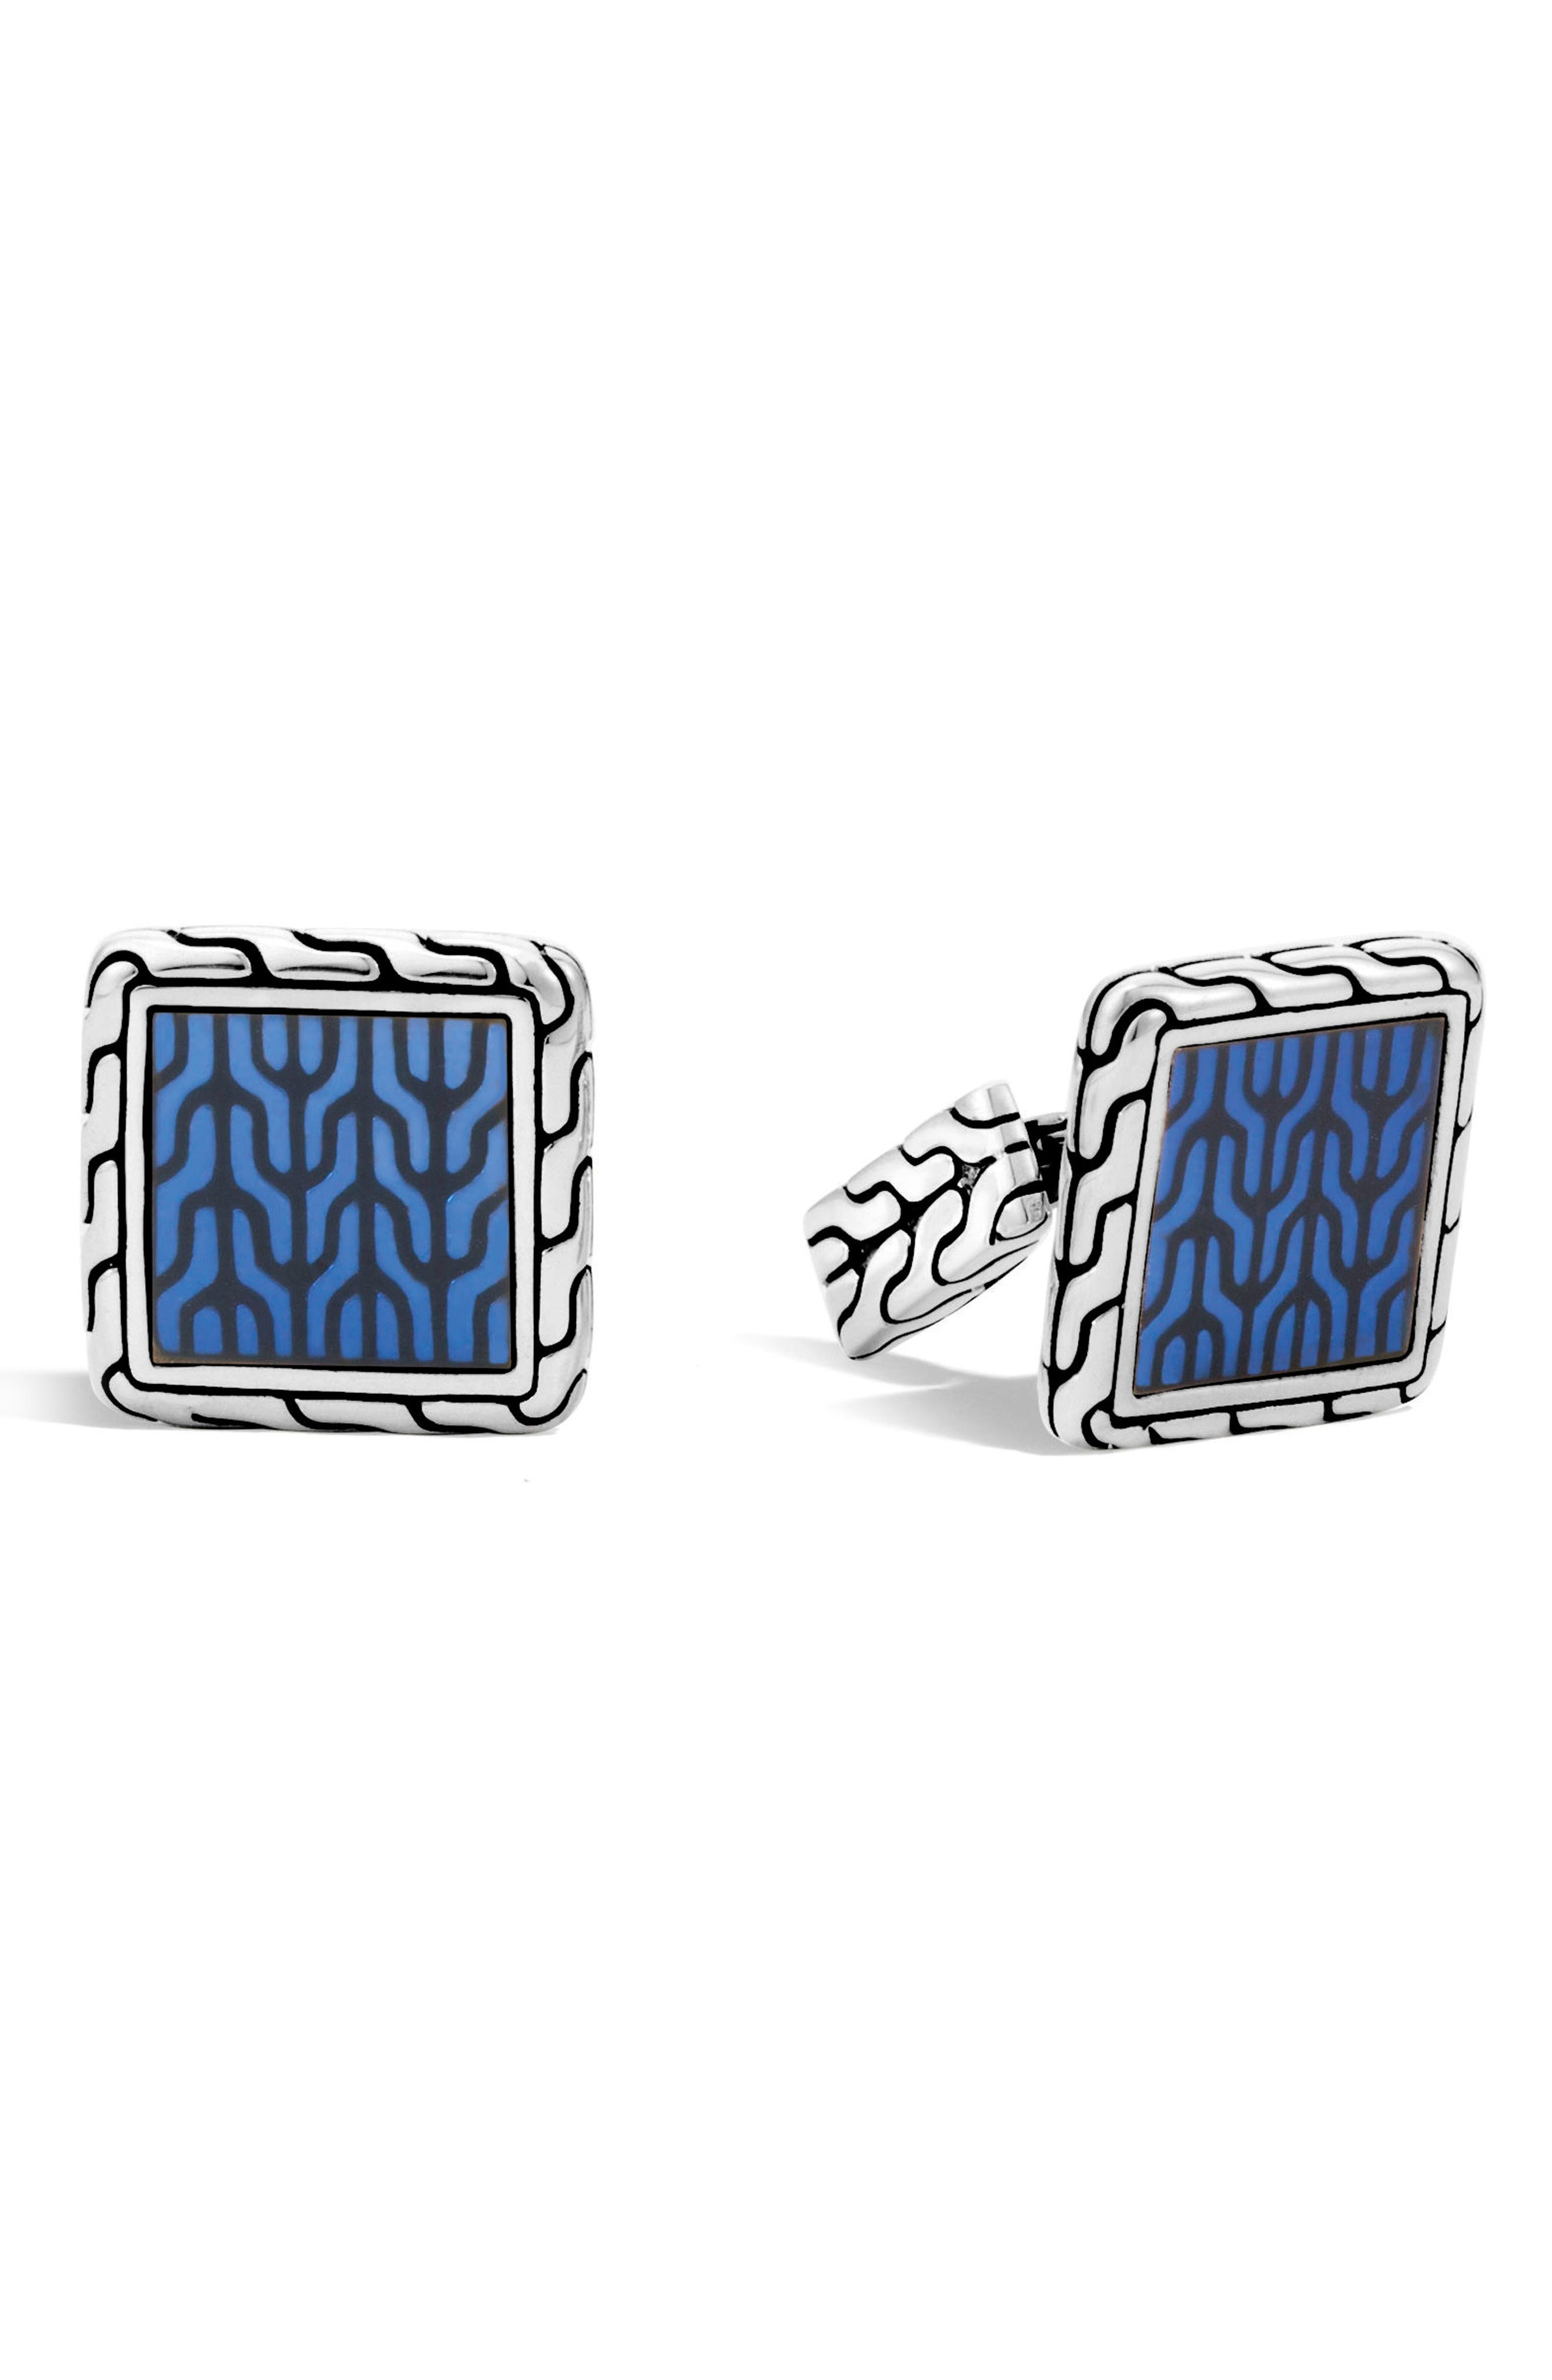 JOHN HARDY Classic Chain Silver Enamel Square Cuff Links, Main, color, SILVER/ BLUE